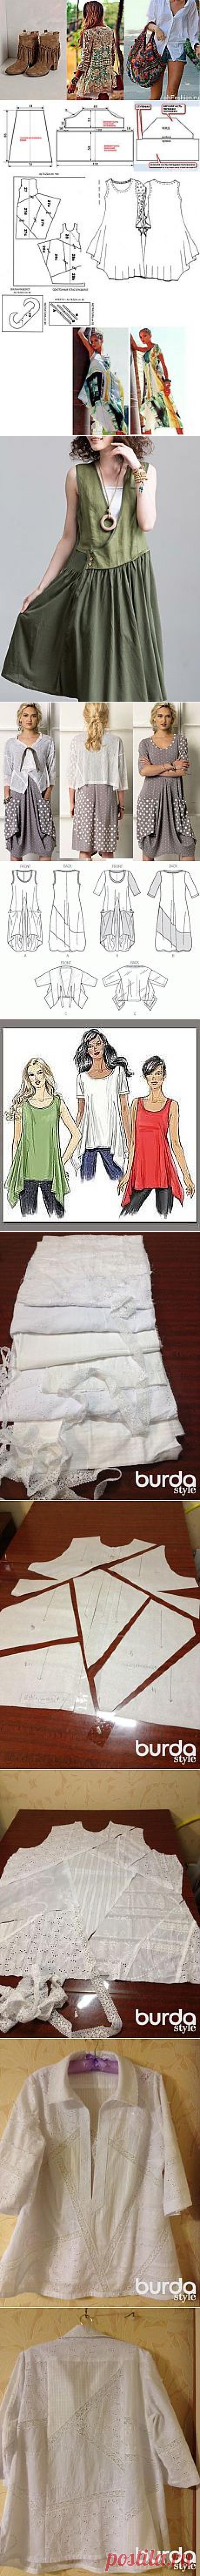 Одежда в стиле бохо с выкройками.